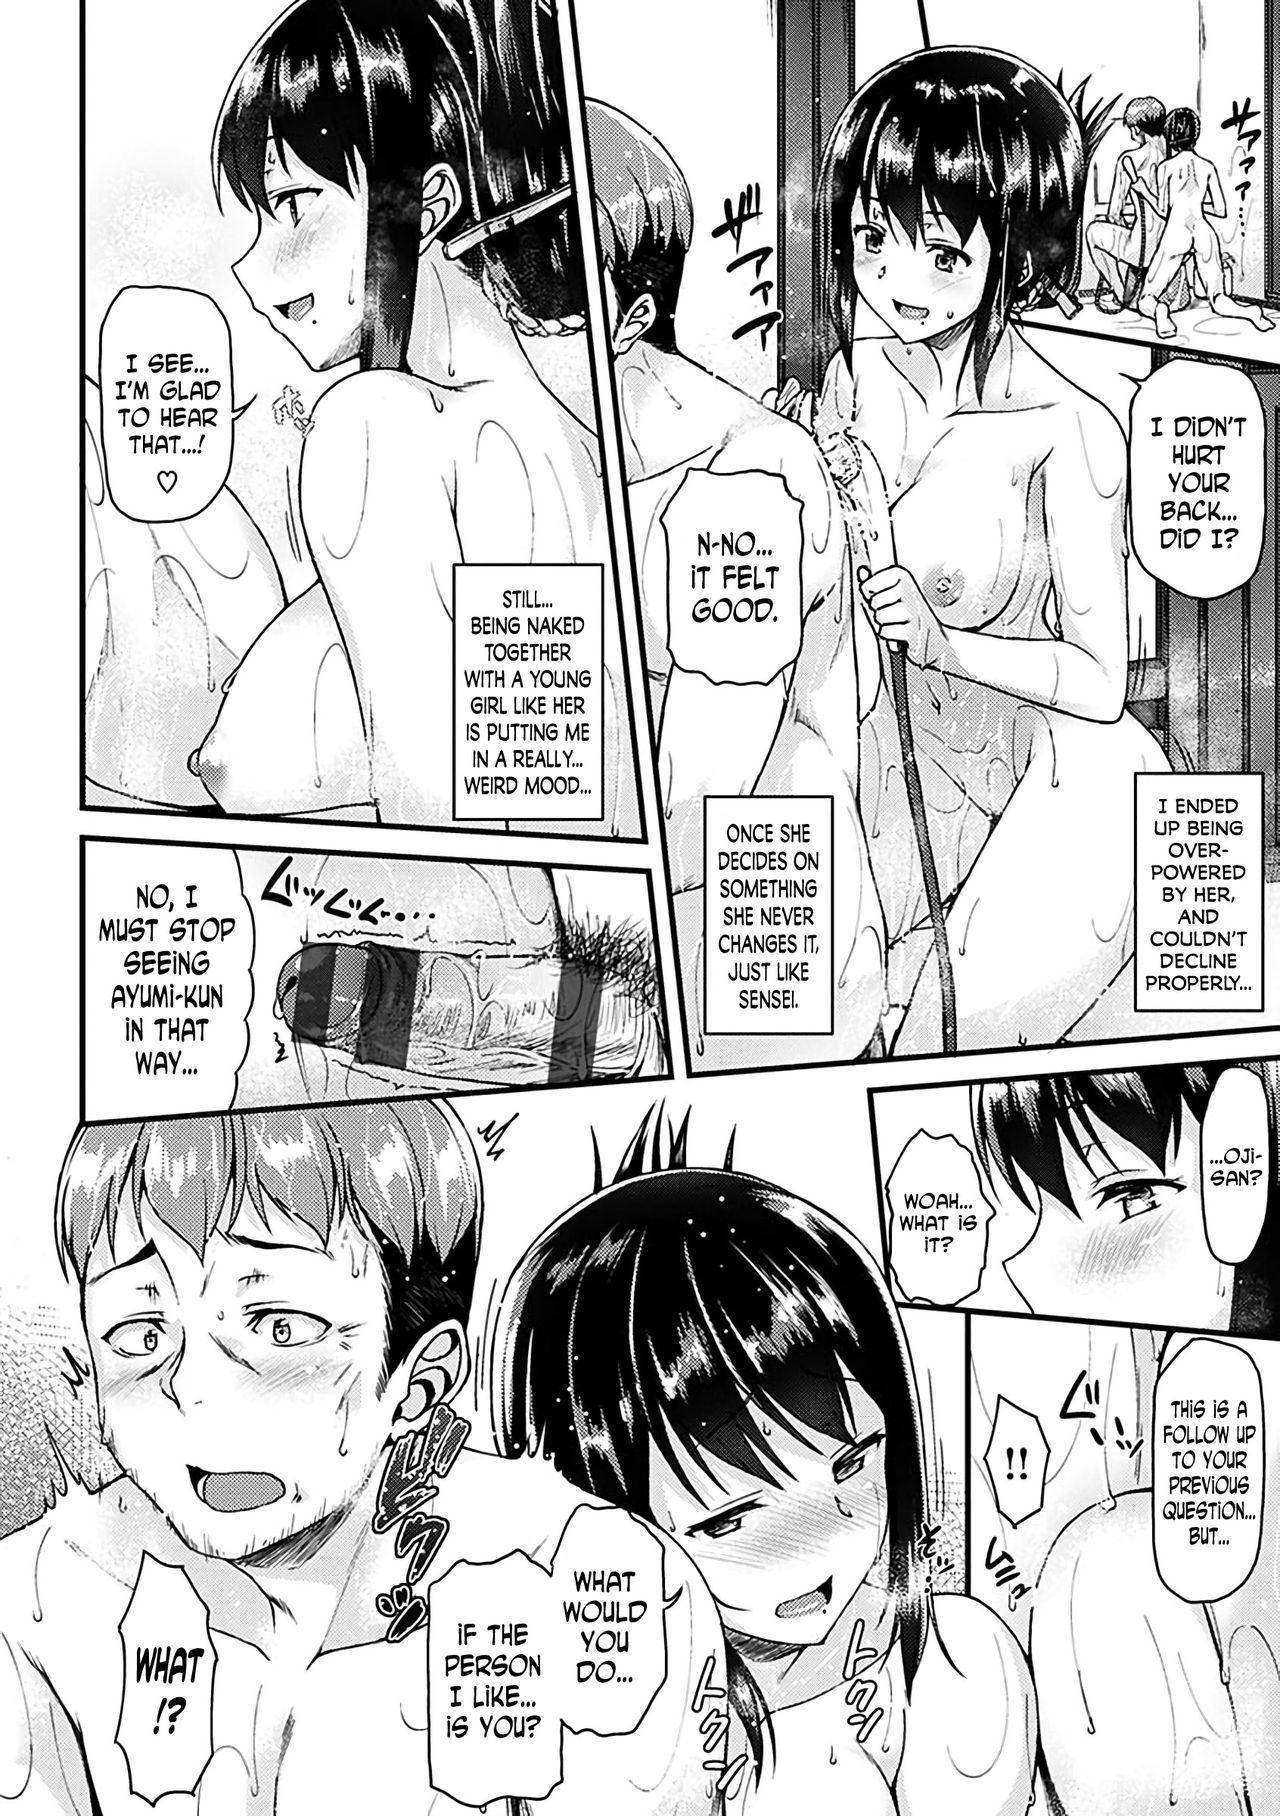 [Saemon] Ironna Kankei - Iro-Ero relationship Ch. 1-2, 4, 6, 8, 10, 12 [English] [N04h] [Digital] 47